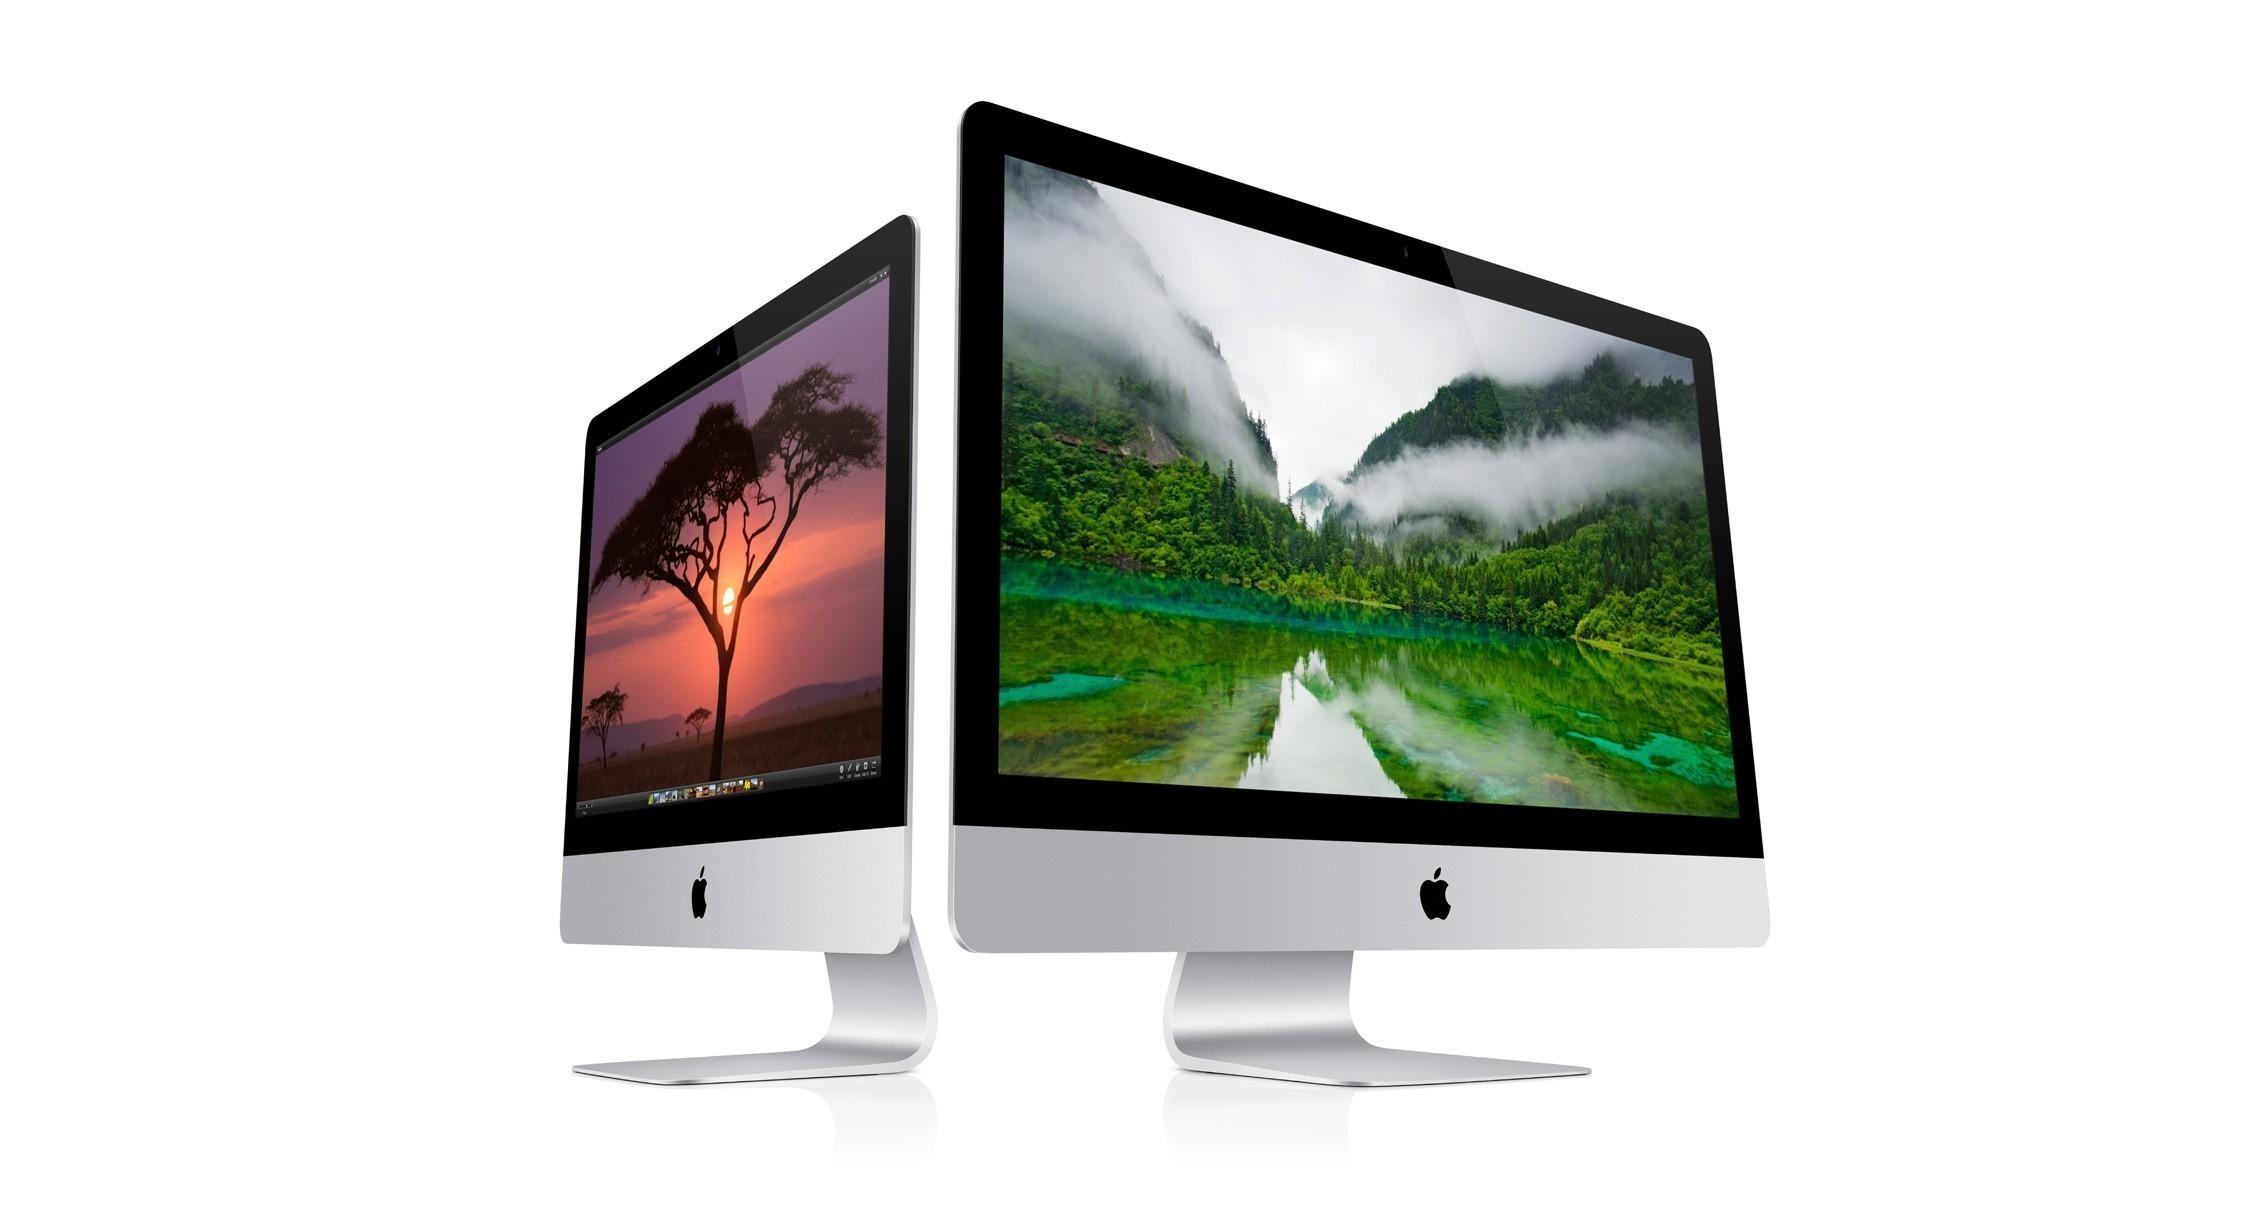 "Apple iMac (Z0VY0013R, Z0VY/<wbr>5) Silver 21.5"" Retina 4K (4096x2304) i5 3.0GHz (TB 4.1GHz) 6-core 8th-gen/<wbr>16GB/<wbr>256Gb SSD/<wbr>RadeonPro560X 4GB (2019)"